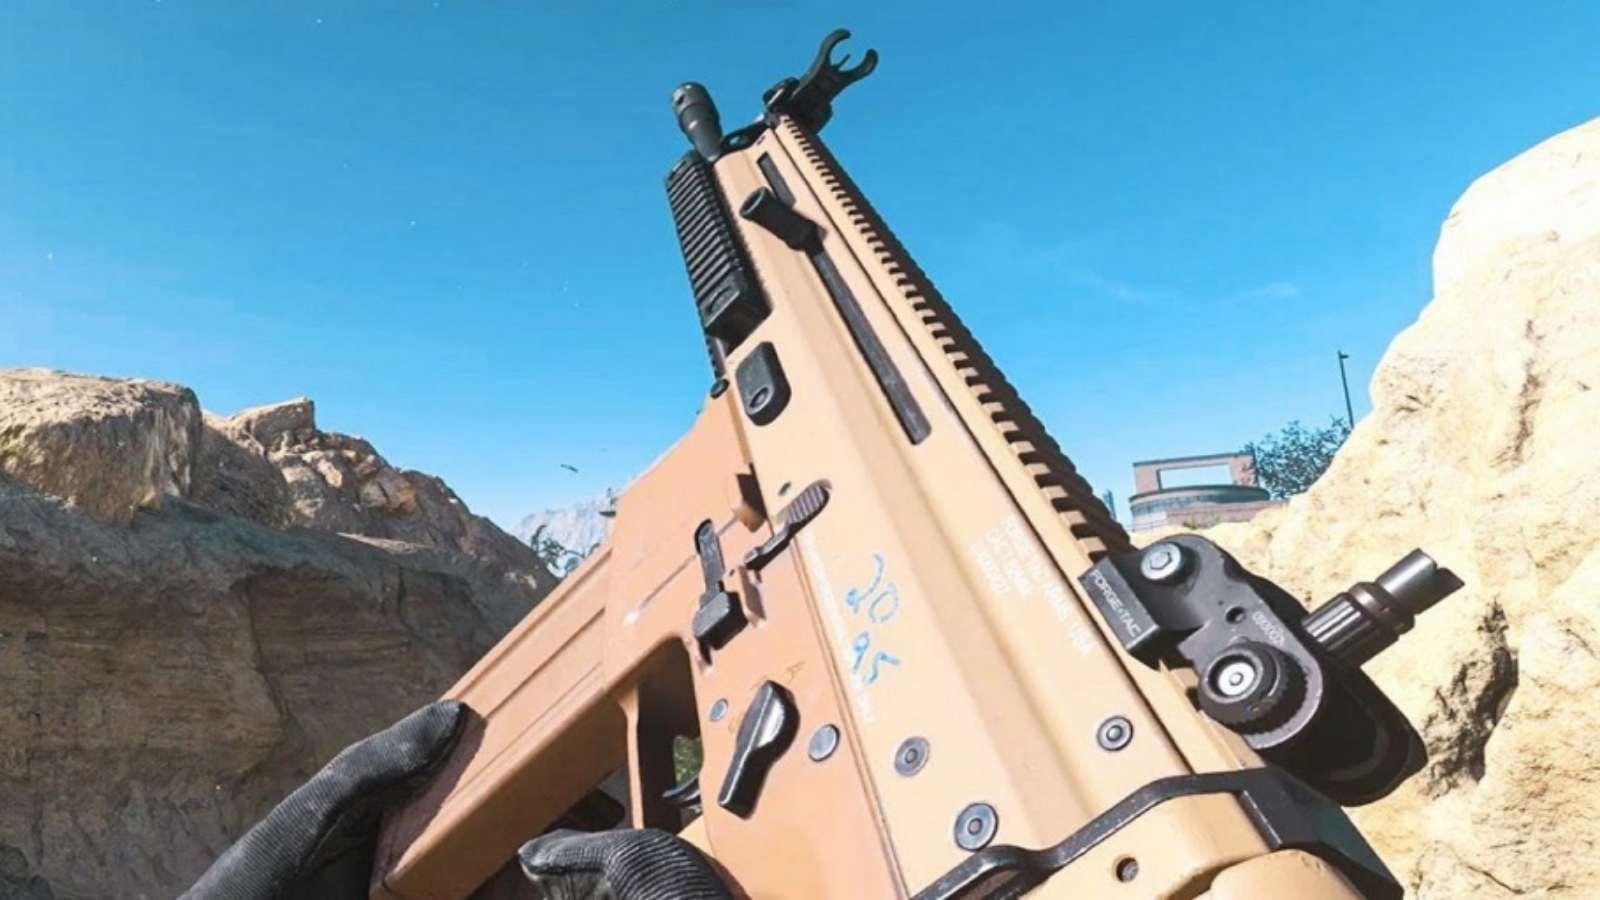 COD Warzone: The Best Scar 17 Warzone Loadout